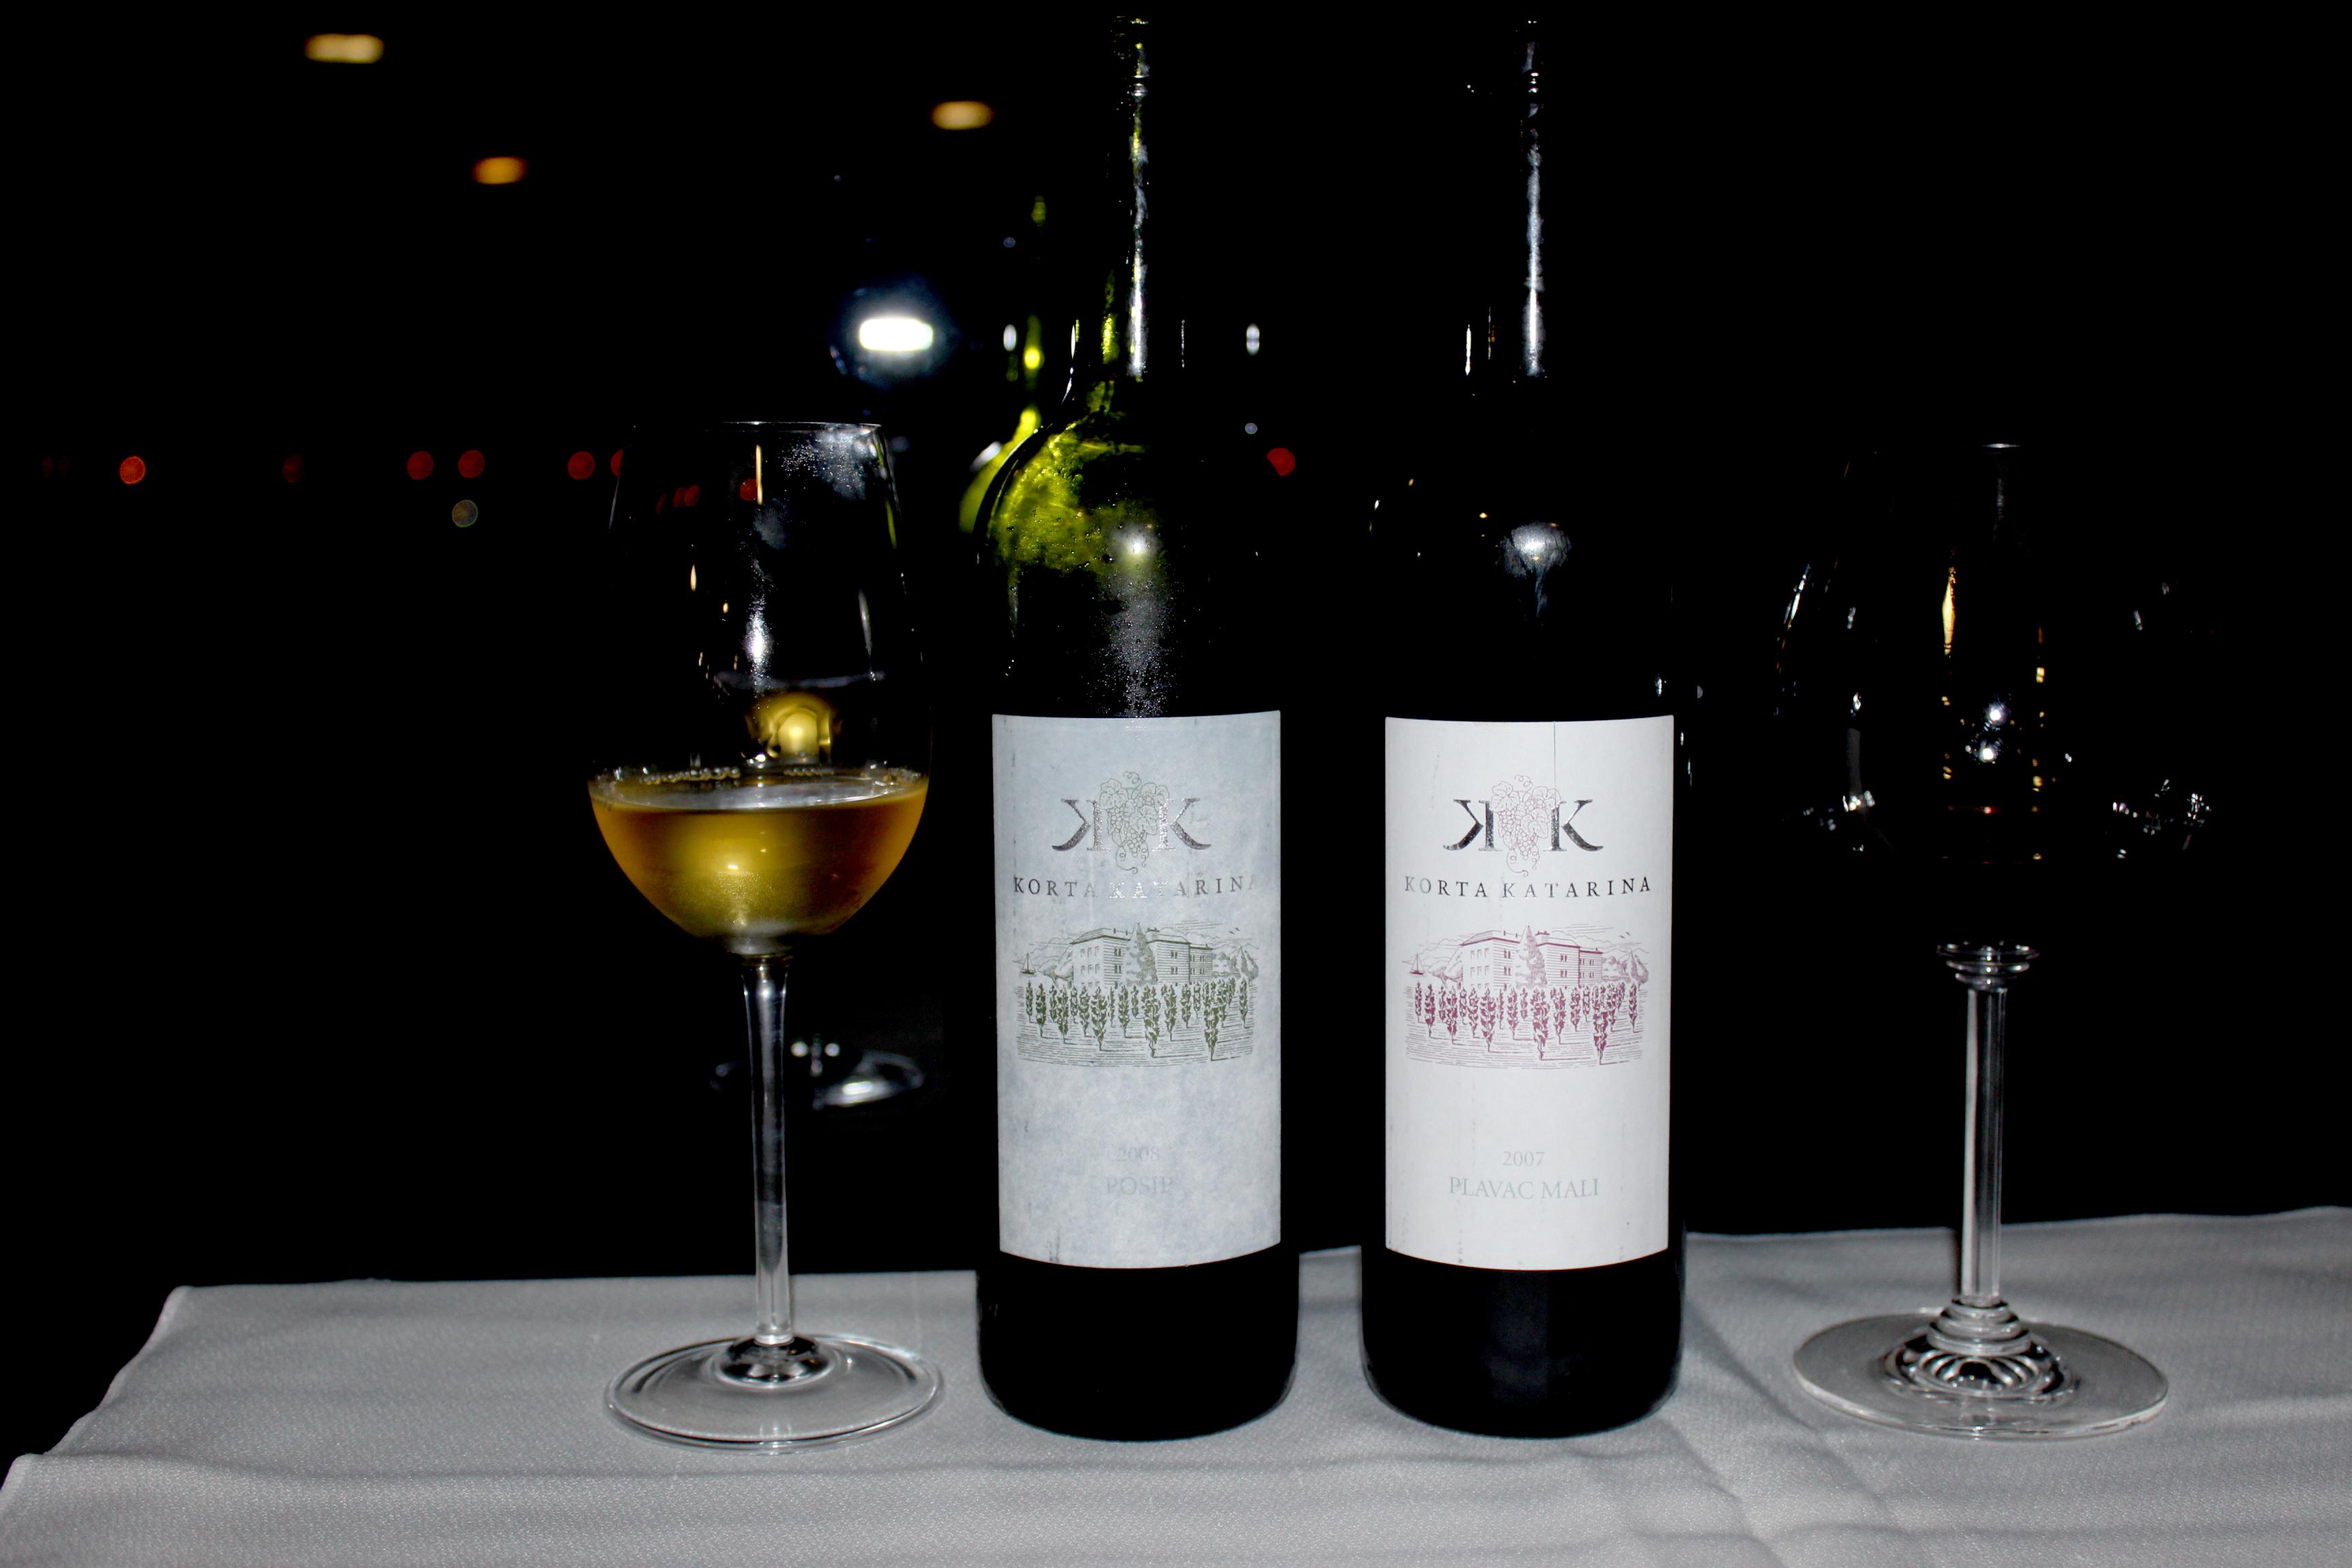 Vinhos da Croácia no Brasil